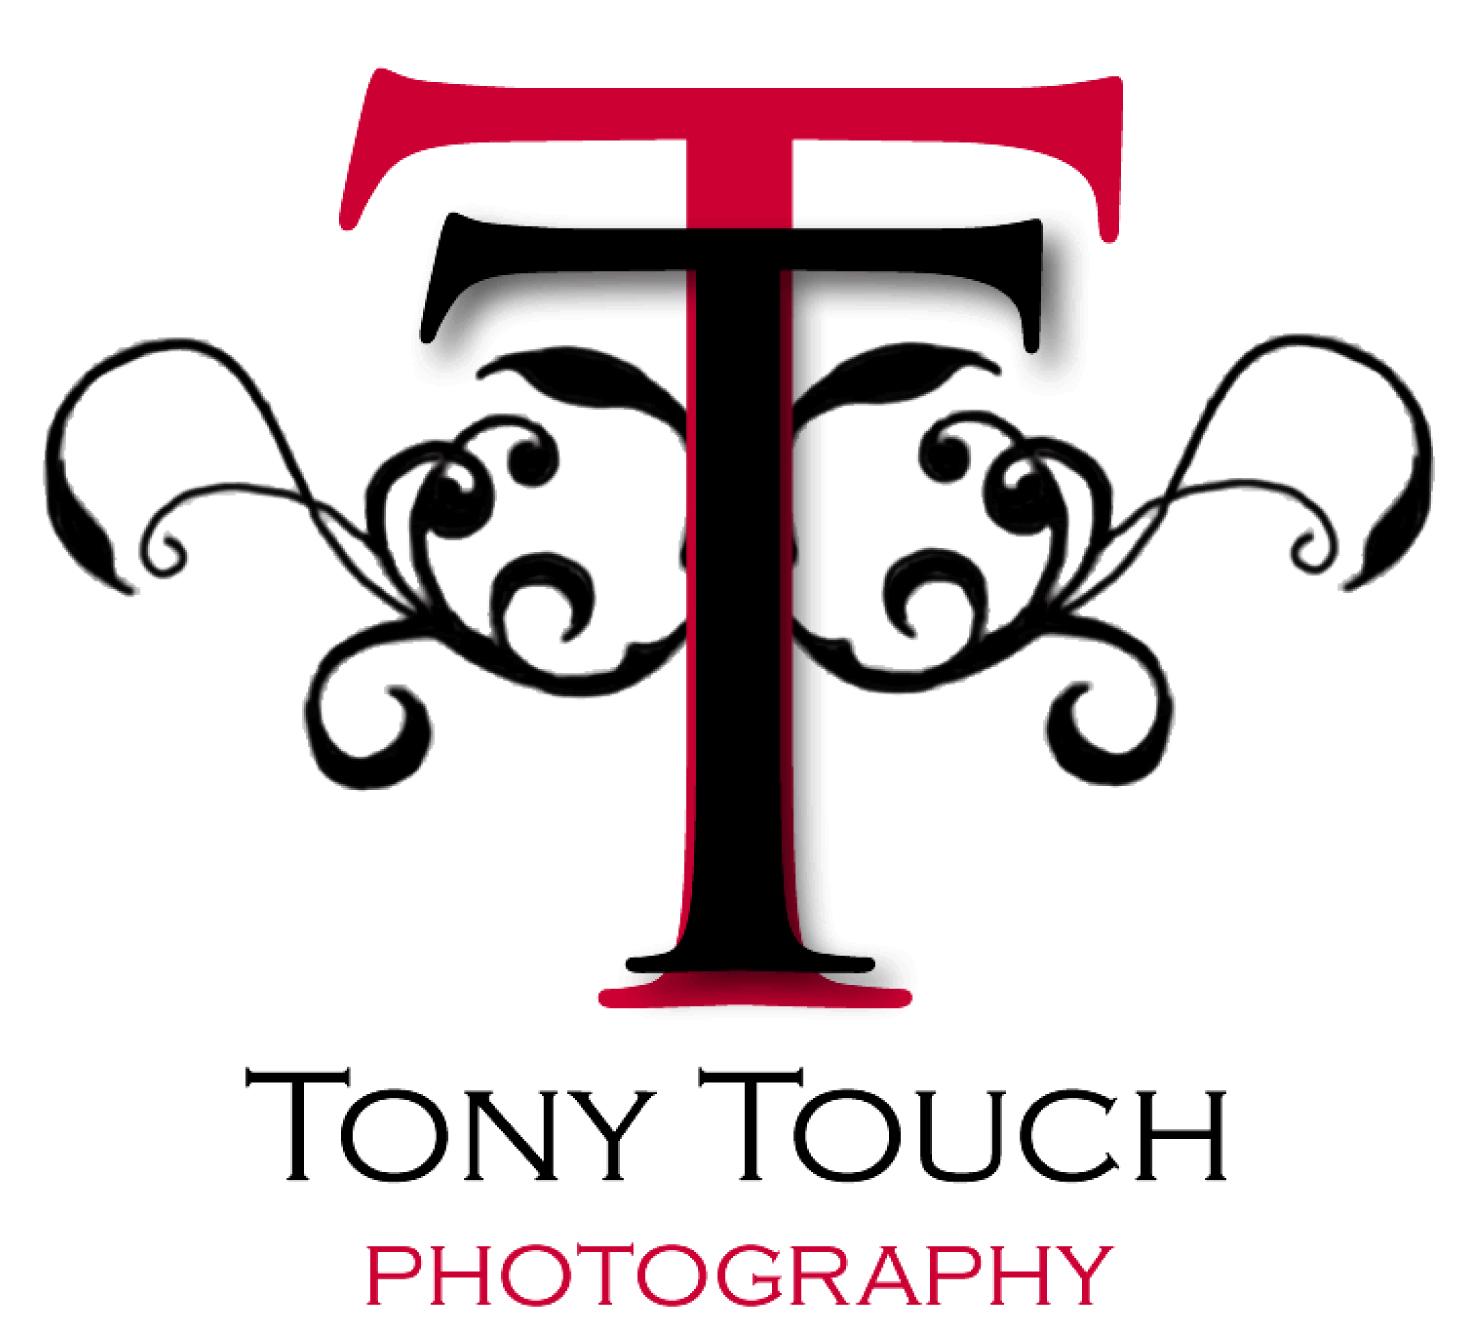 Tony Touch Photography